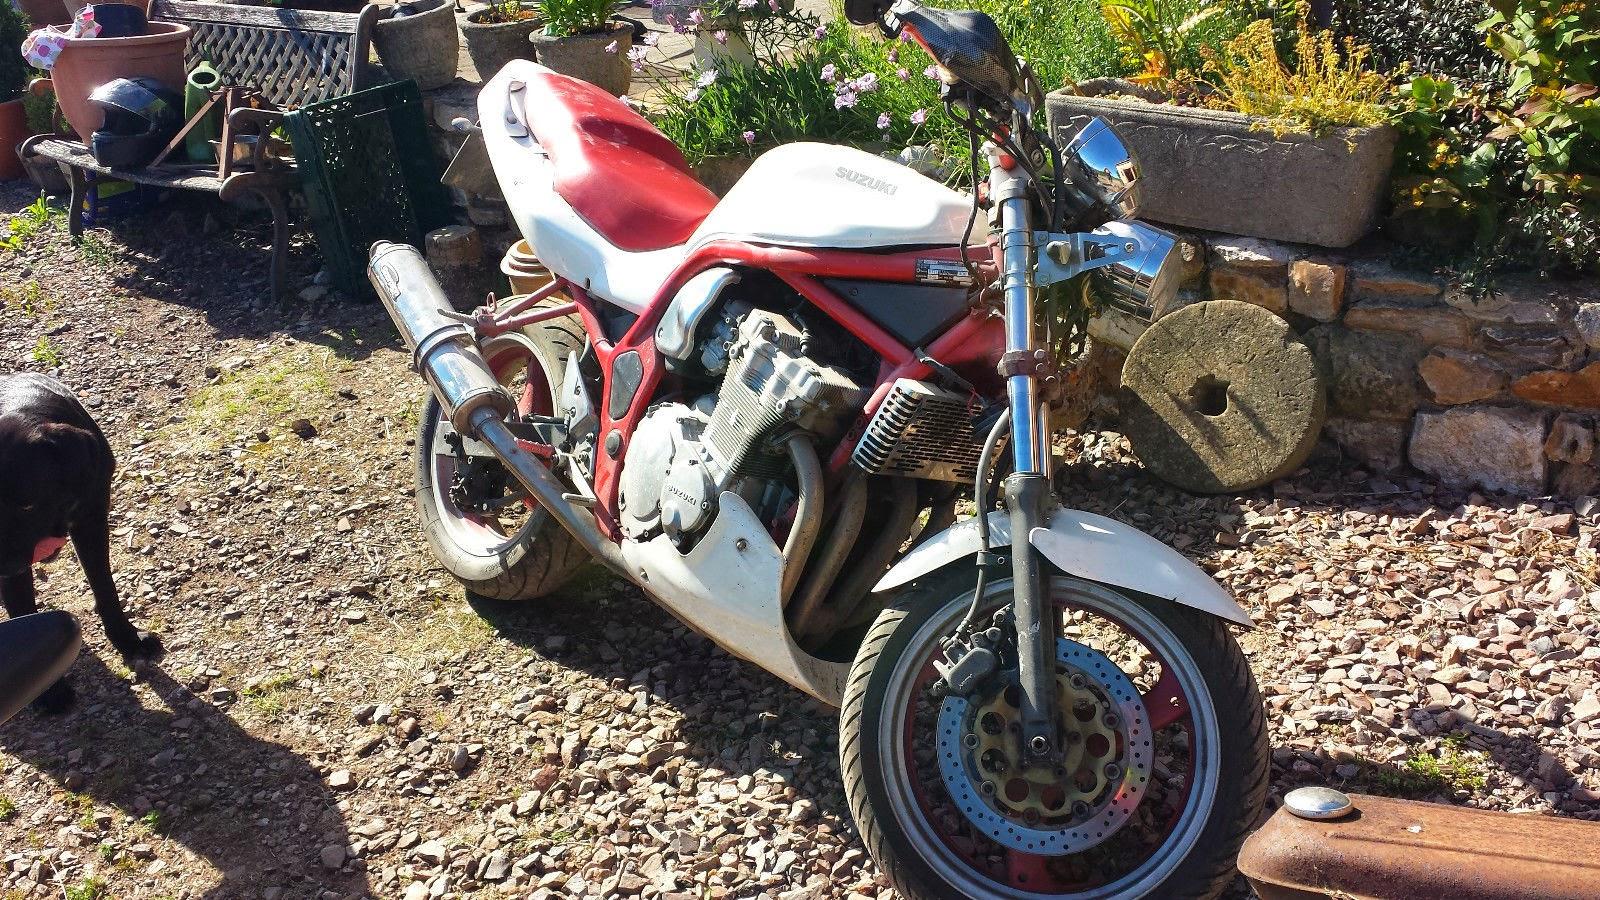 Motorcycle Restoration Projects Uk Suzuki Bandit 600